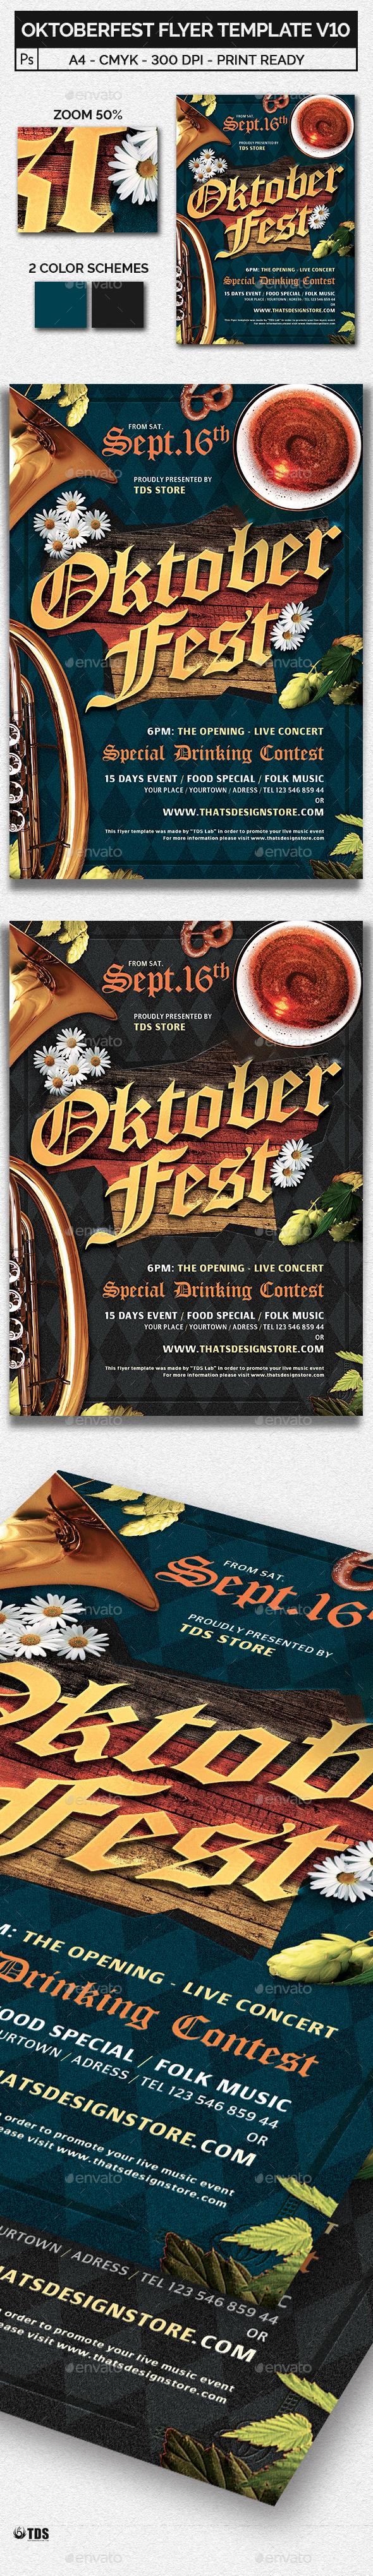 GraphicRiver Oktoberfest Flyer Template V10 20502022